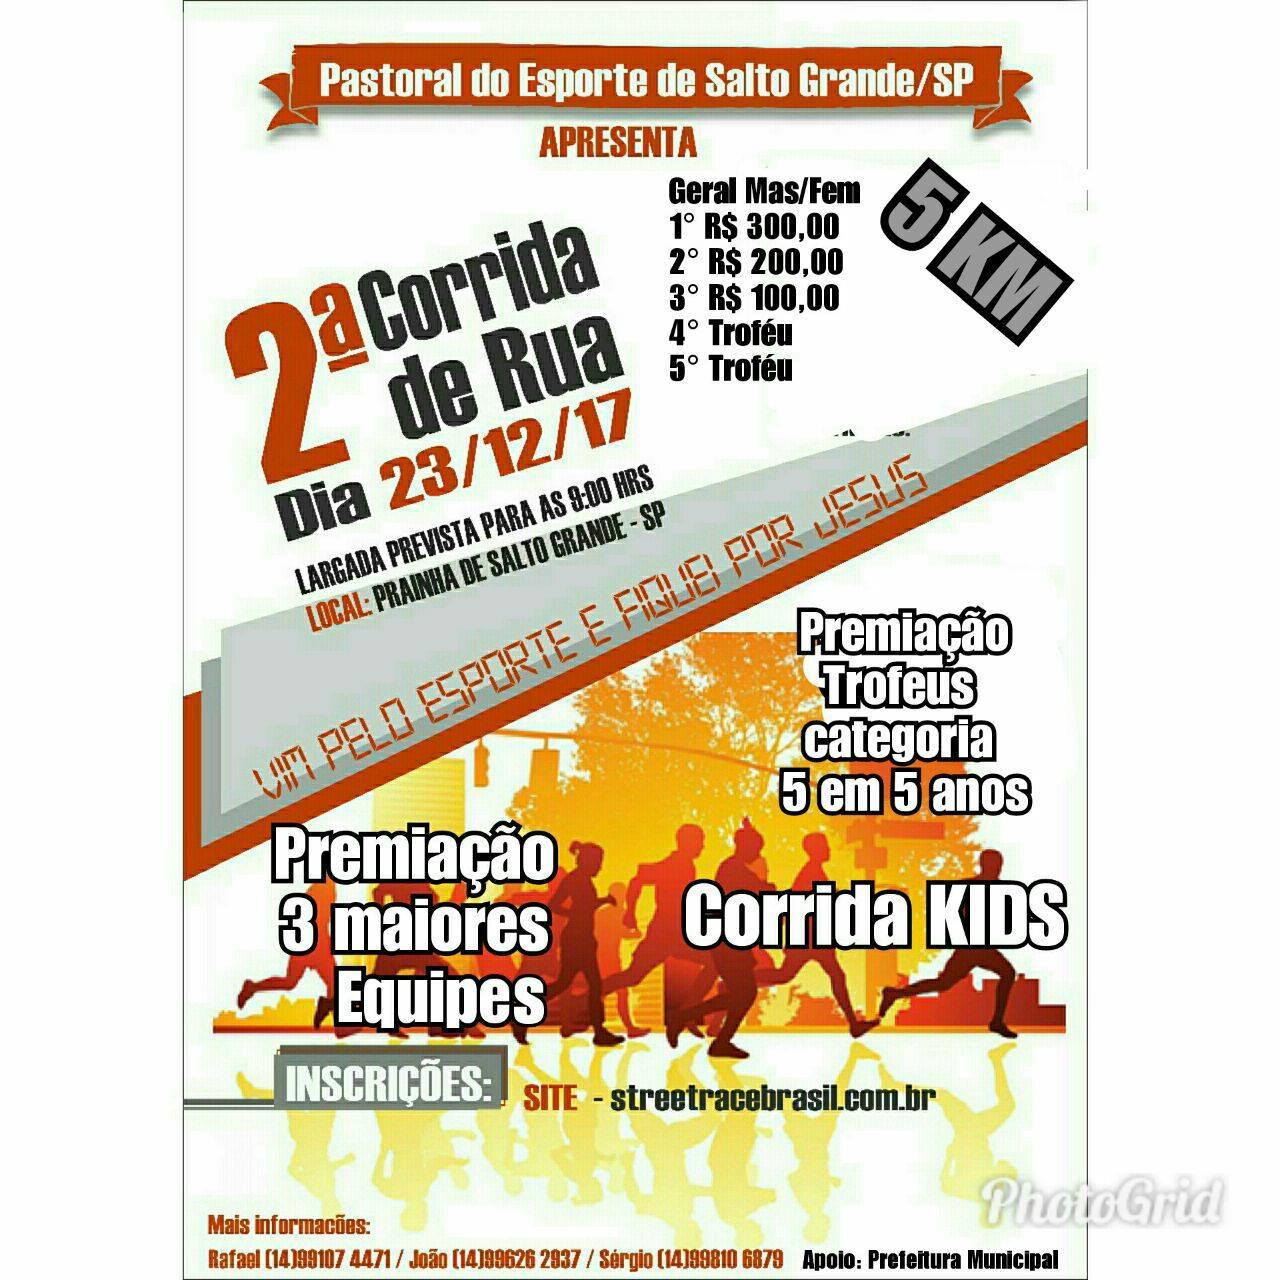 2ª CORRIDA PASTORAL DO ESPORTE DE SALTO GRANDE